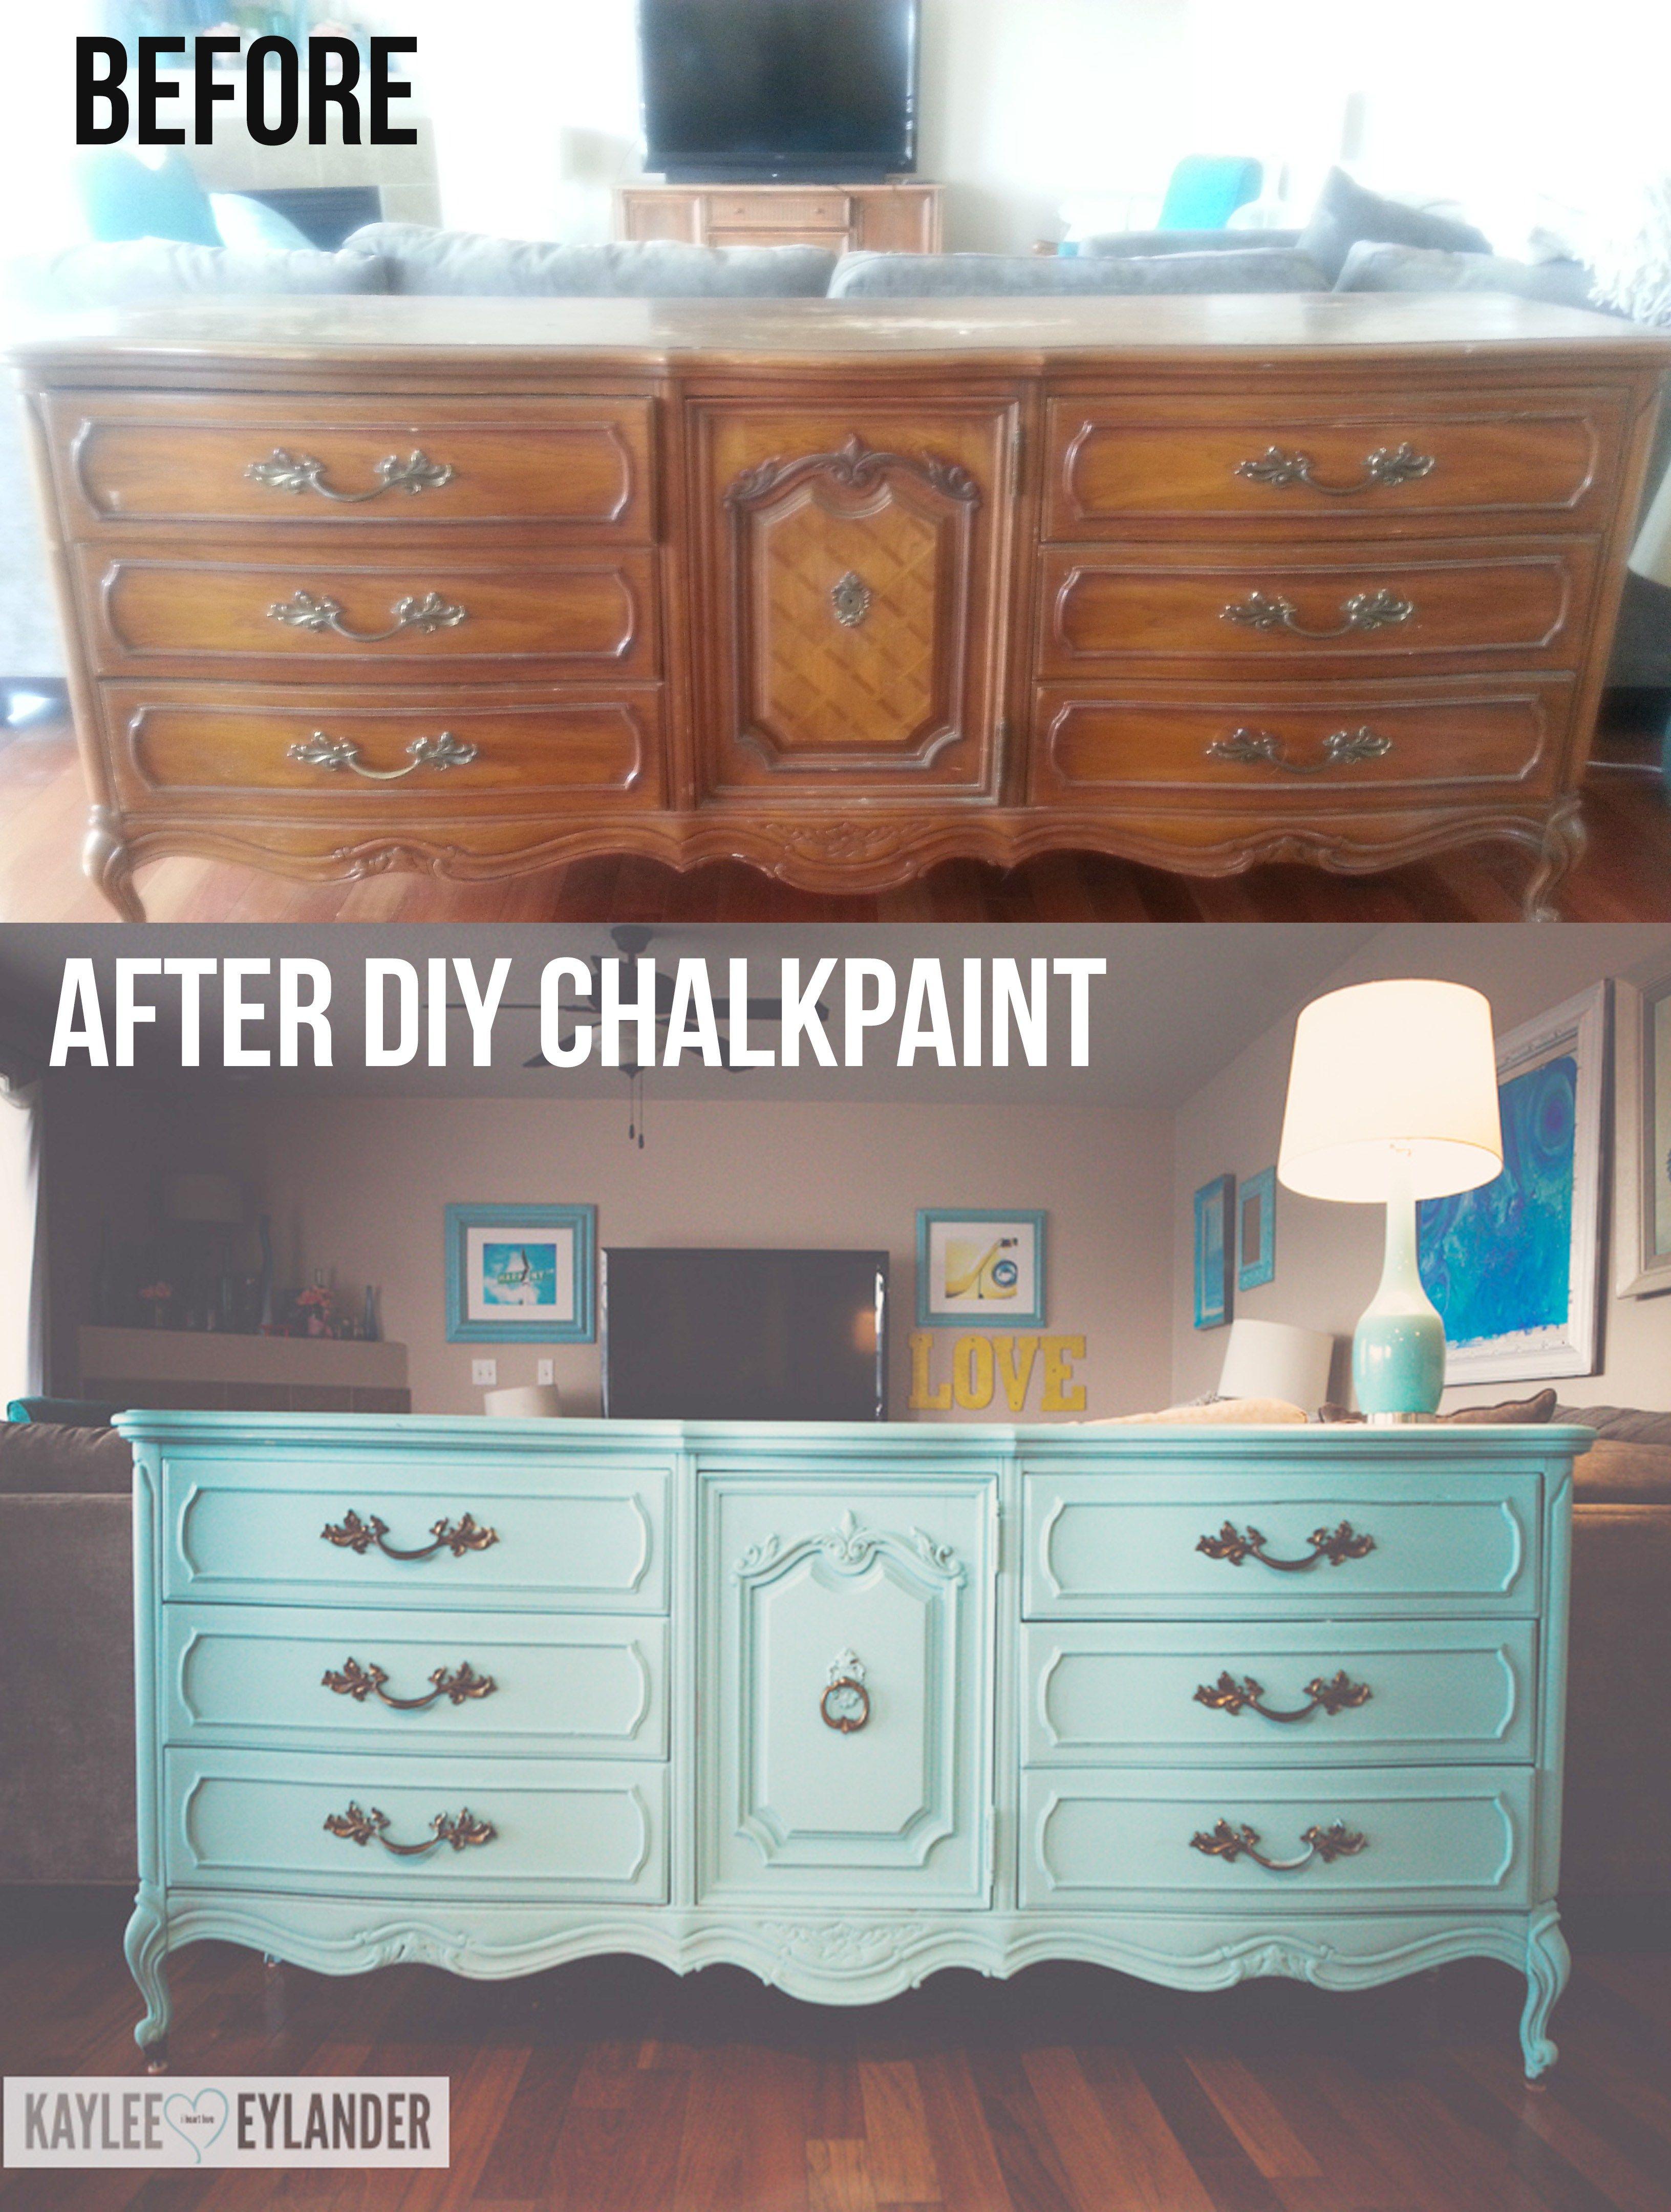 Diy chalk paint recipe furniture makeover diy furniture